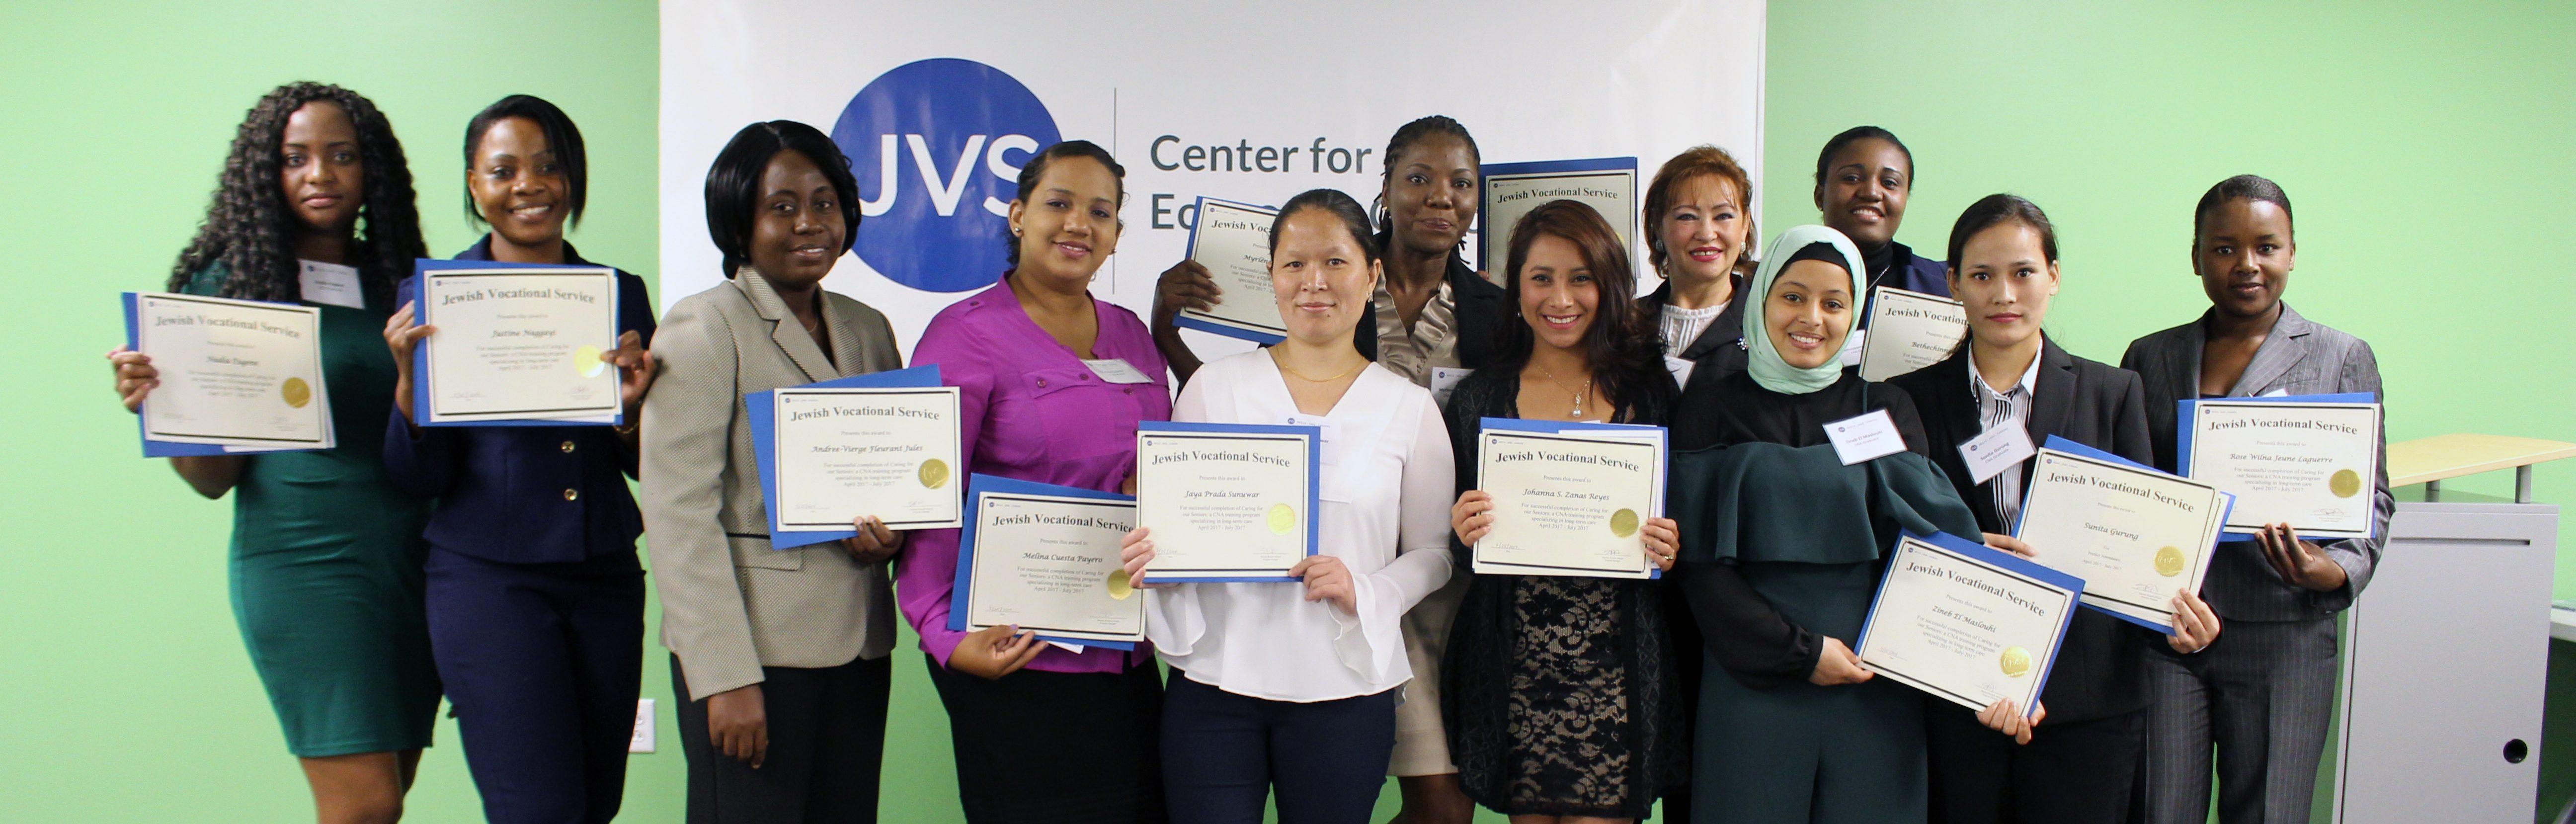 JVS Nursing Assistant Training Program graduates holding their certificates at graduation